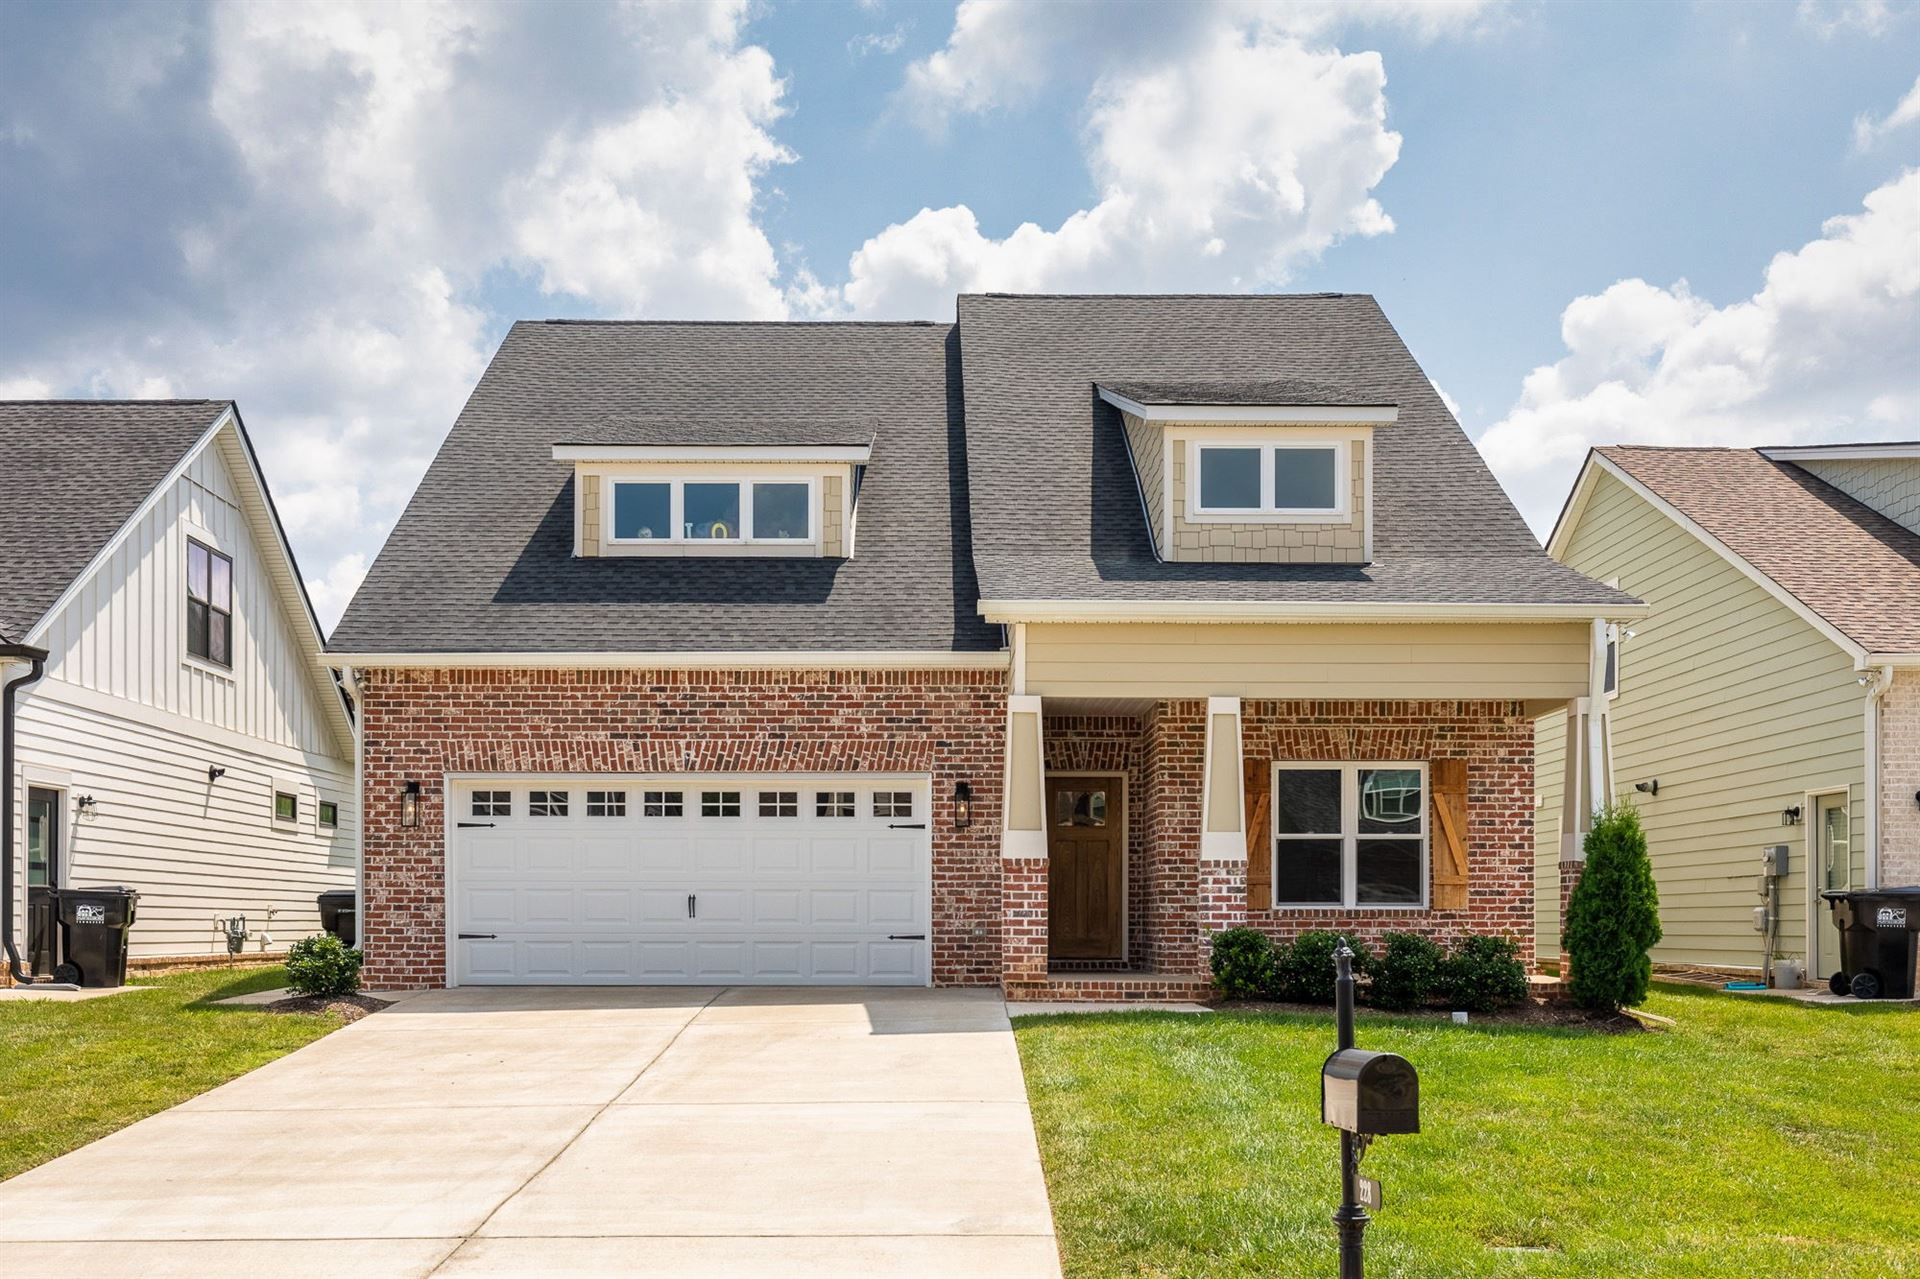 228 Rockcastle Dr, Murfreesboro, TN 37128 - MLS#: 2275802